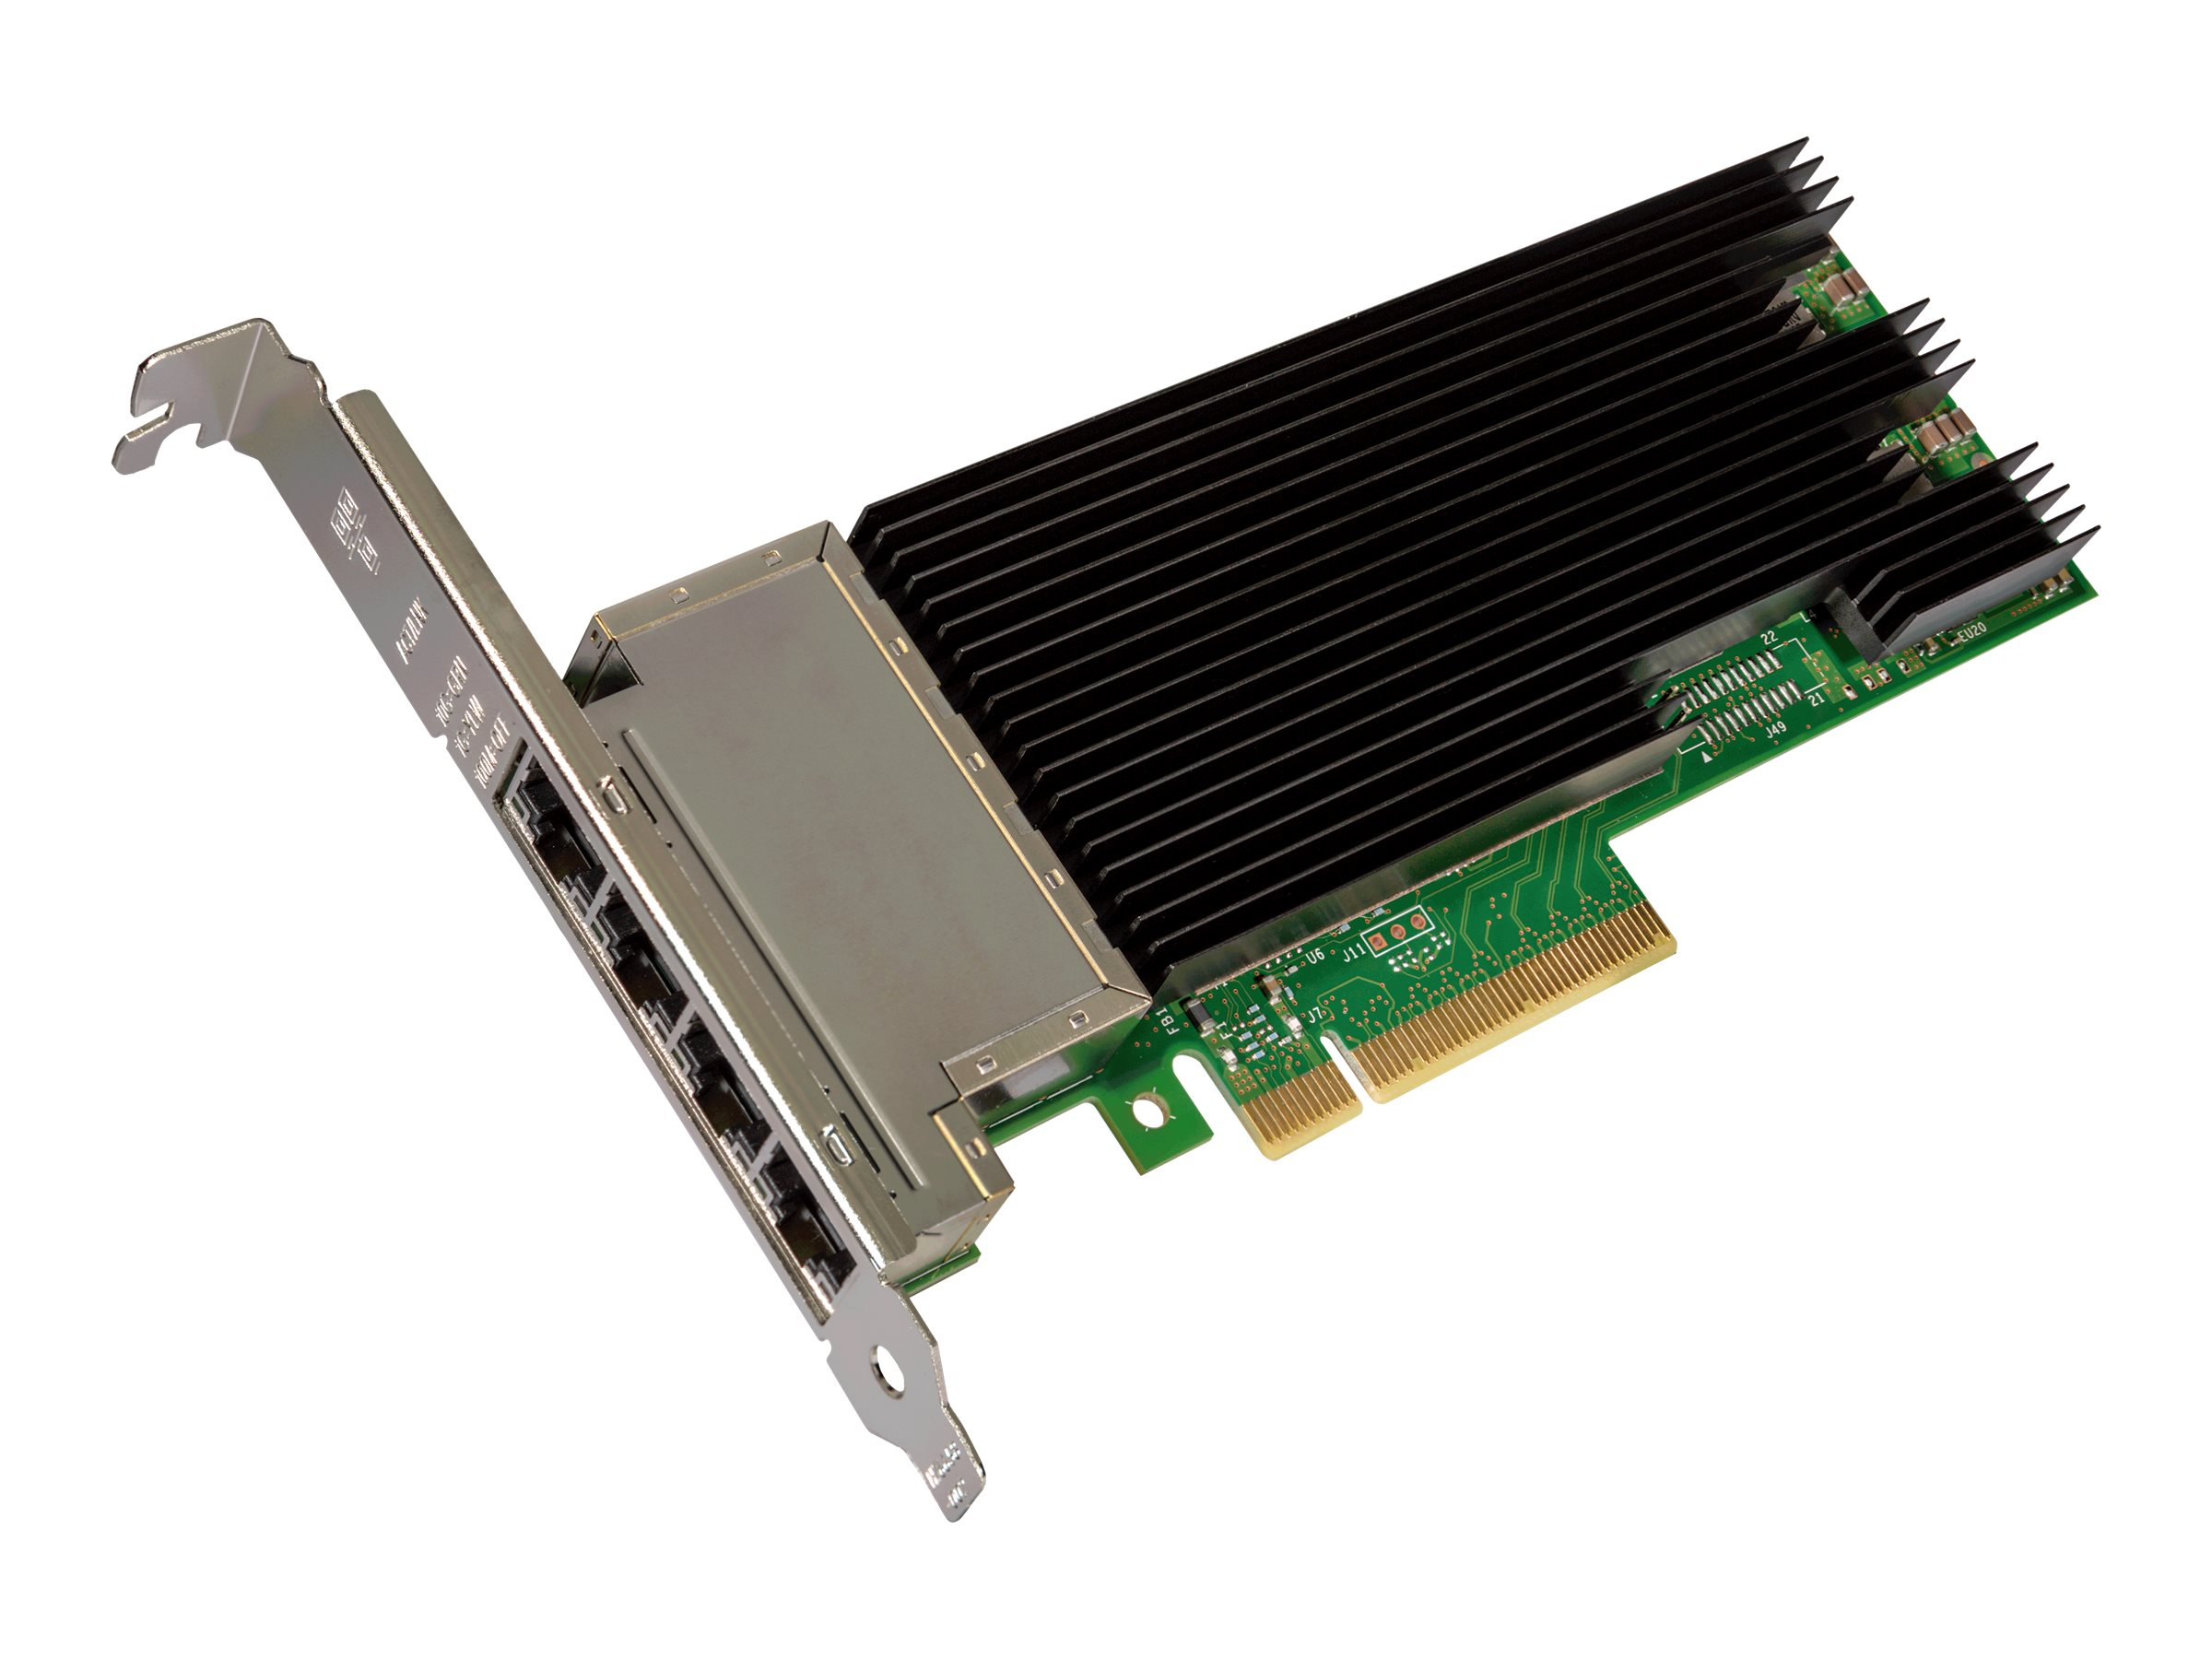 Intel Ethernet Converged Network Adapter X710-T4 - Netzwerkadapter - PCIe 3.0 x8 Low-Profile - 10Gb Ethernet x 4